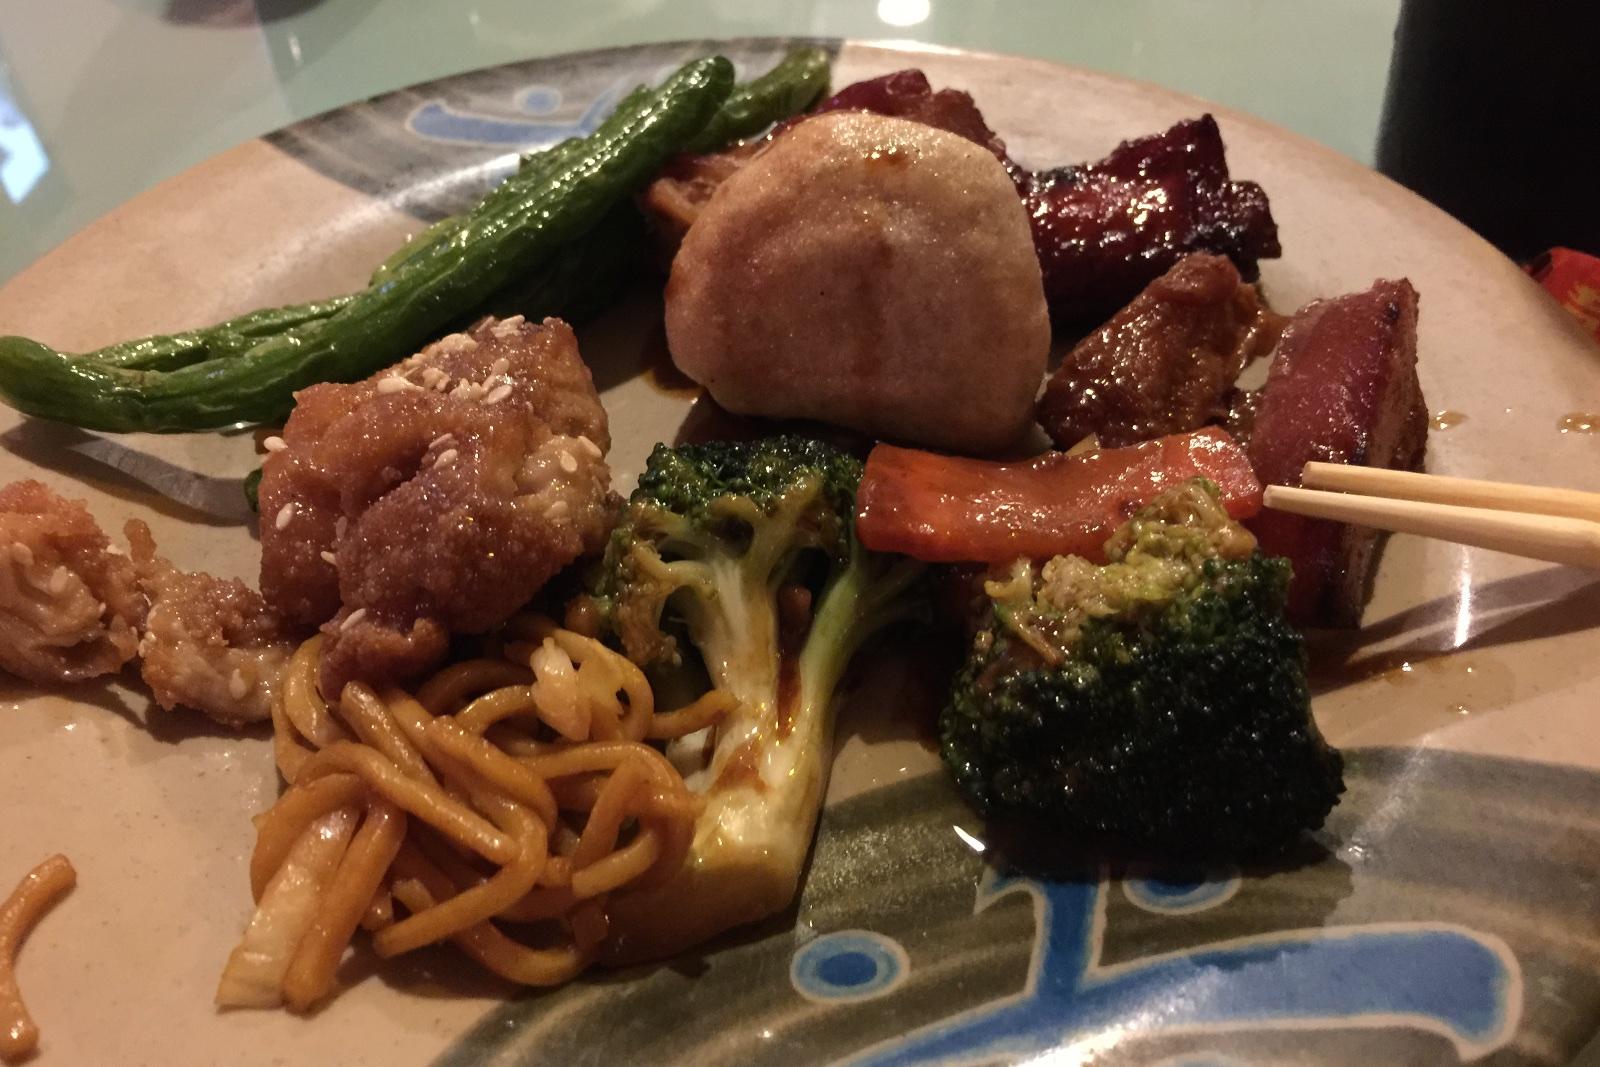 http://blog.rickk.com/food/2014/11/17/ate.2014.11.16.d1.jpg